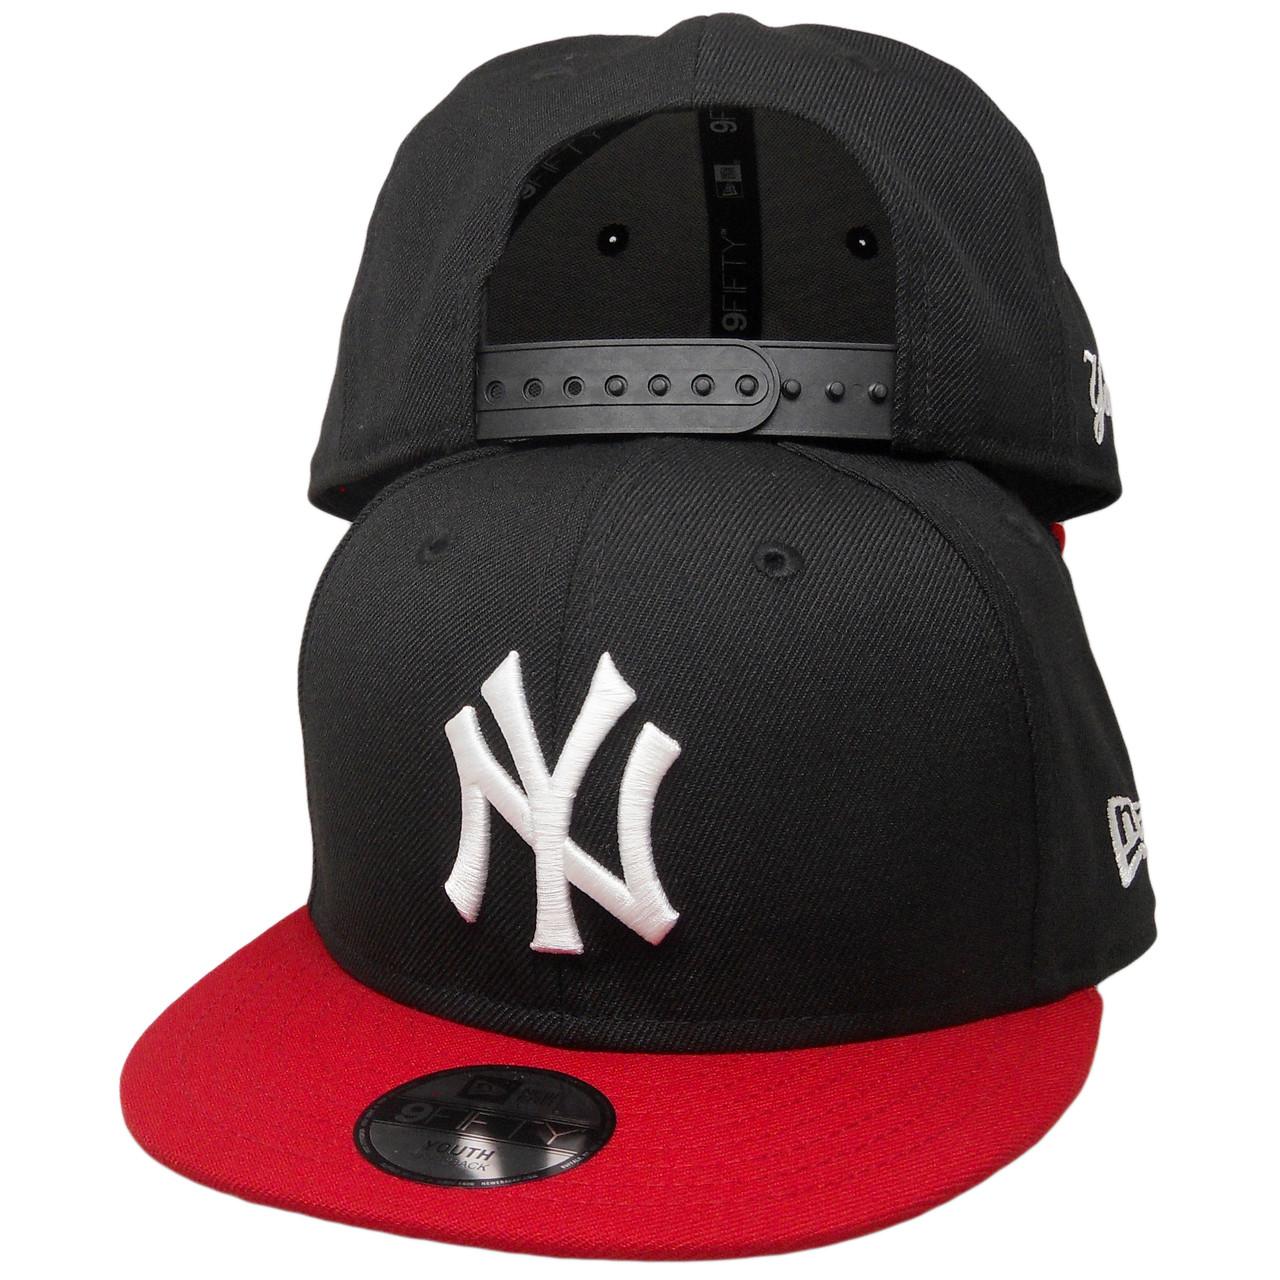 e97c5fa13 New York Yankees New Era Custom KIDS 9Fifty Snapback - Black, Red, White -  ECapsUnlimited.com